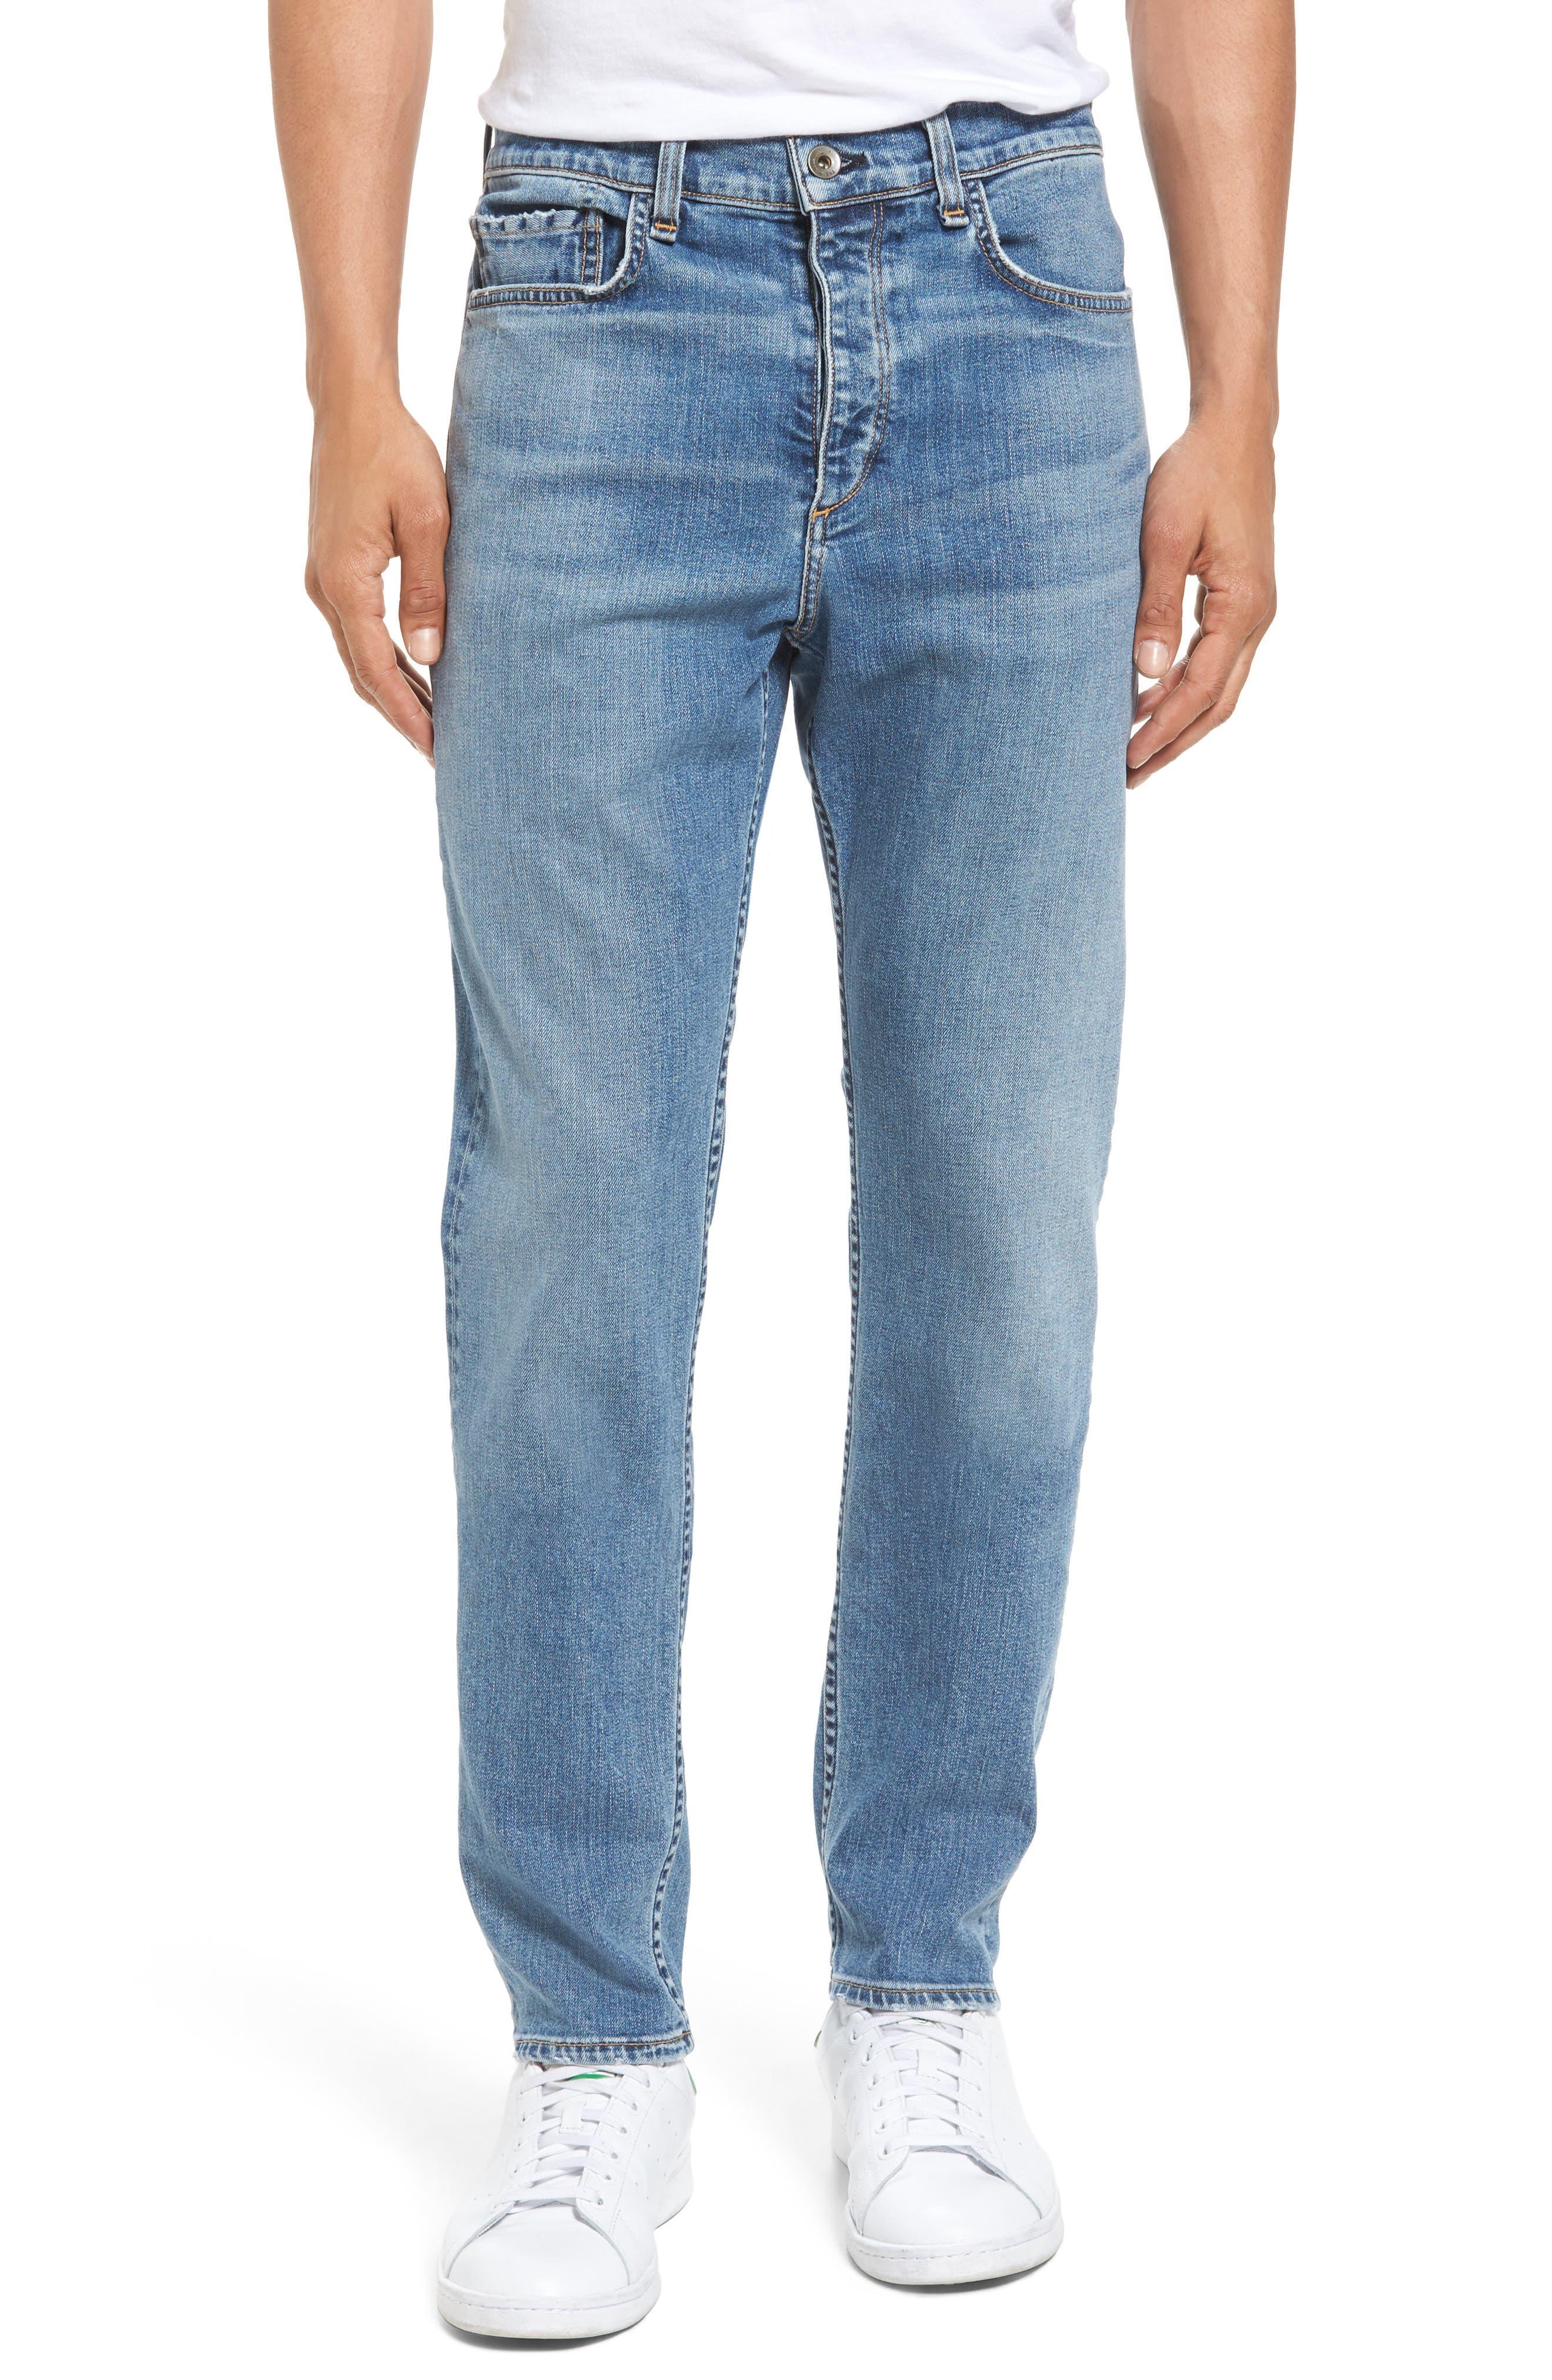 Fit 2 Slim Fit Jeans,                         Main,                         color, DARK KINGSTON